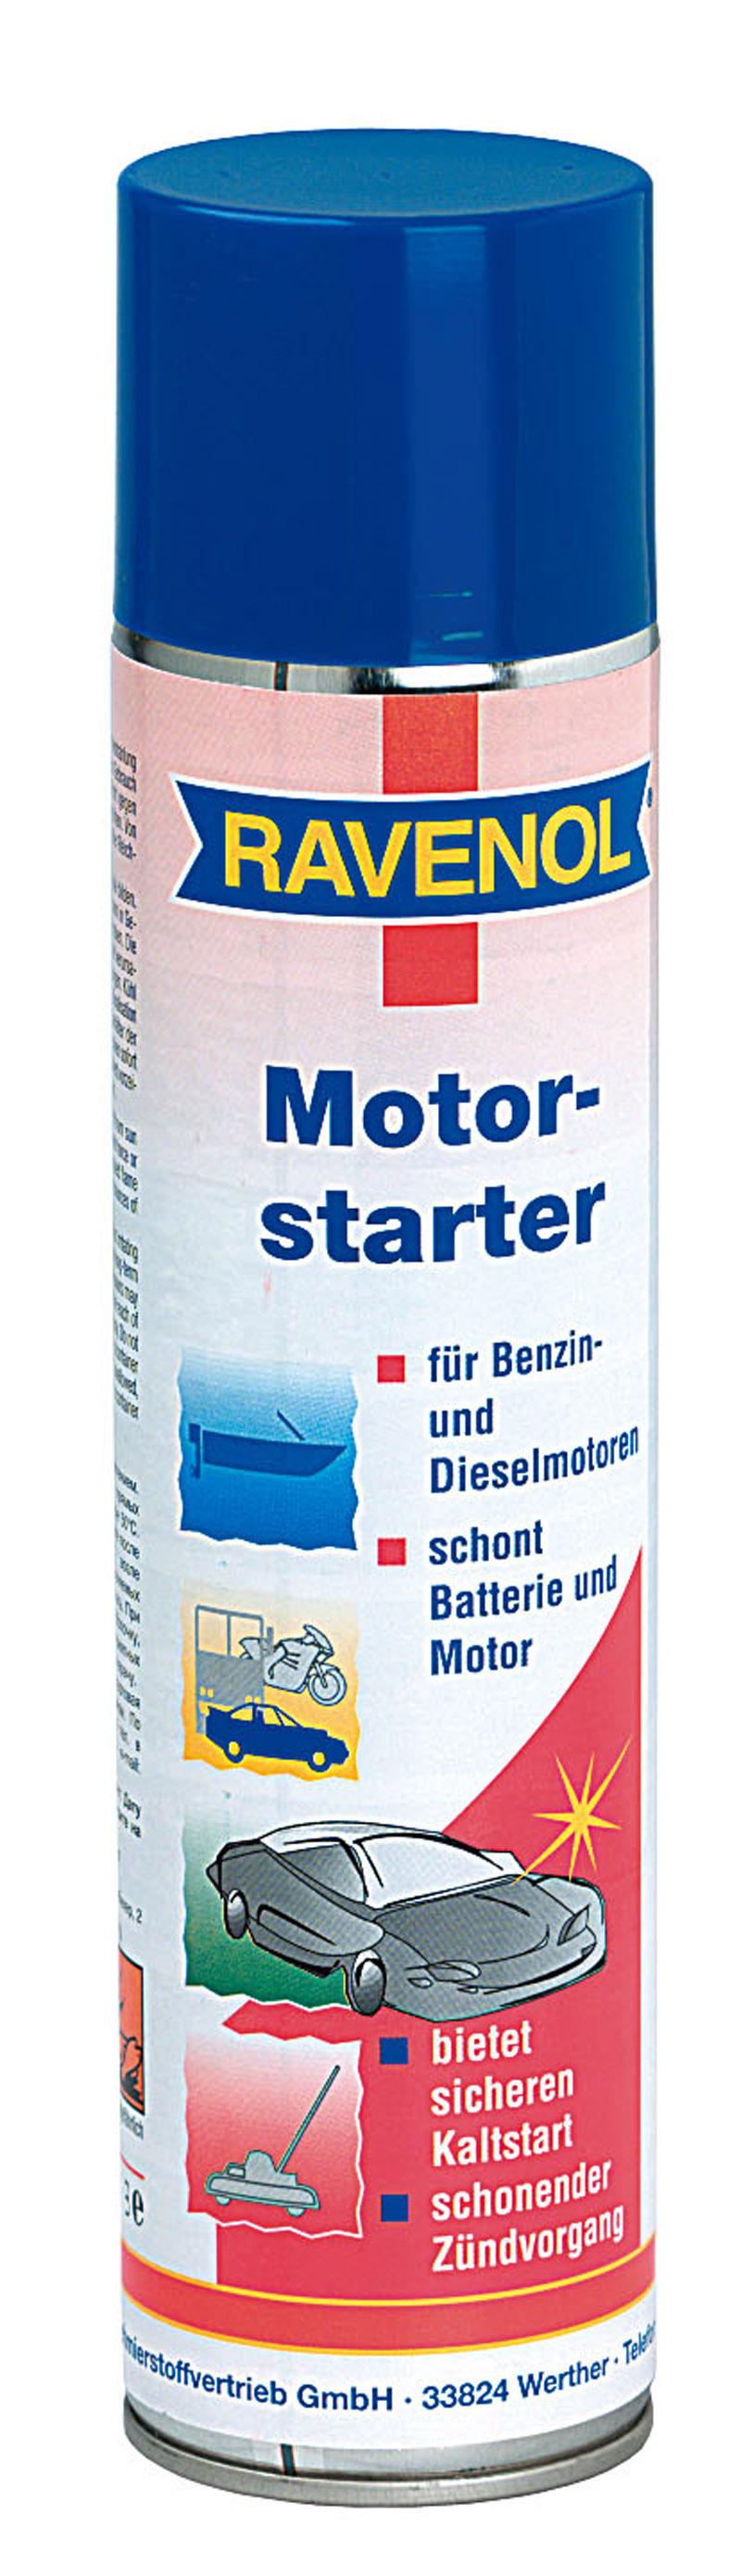 Motor Starter Spray RAVENOL 1360034 0.4L